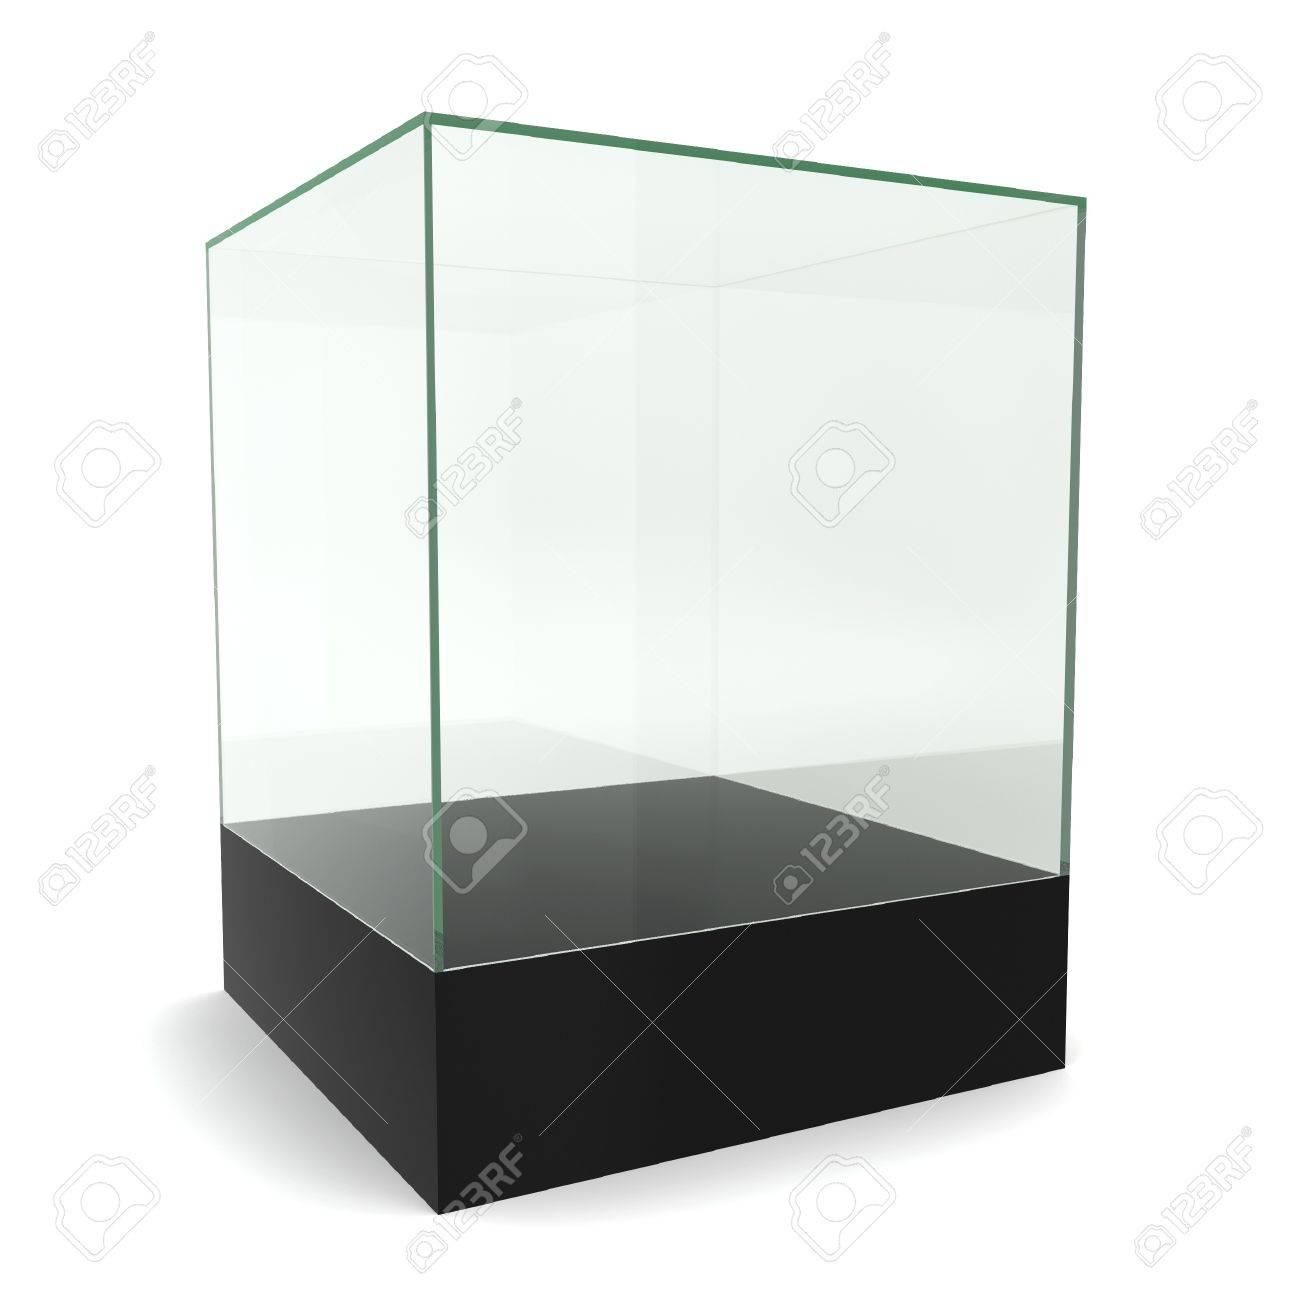 Glass cube on pedestal. 3d illustration on white background Stock Illustration - 21849978